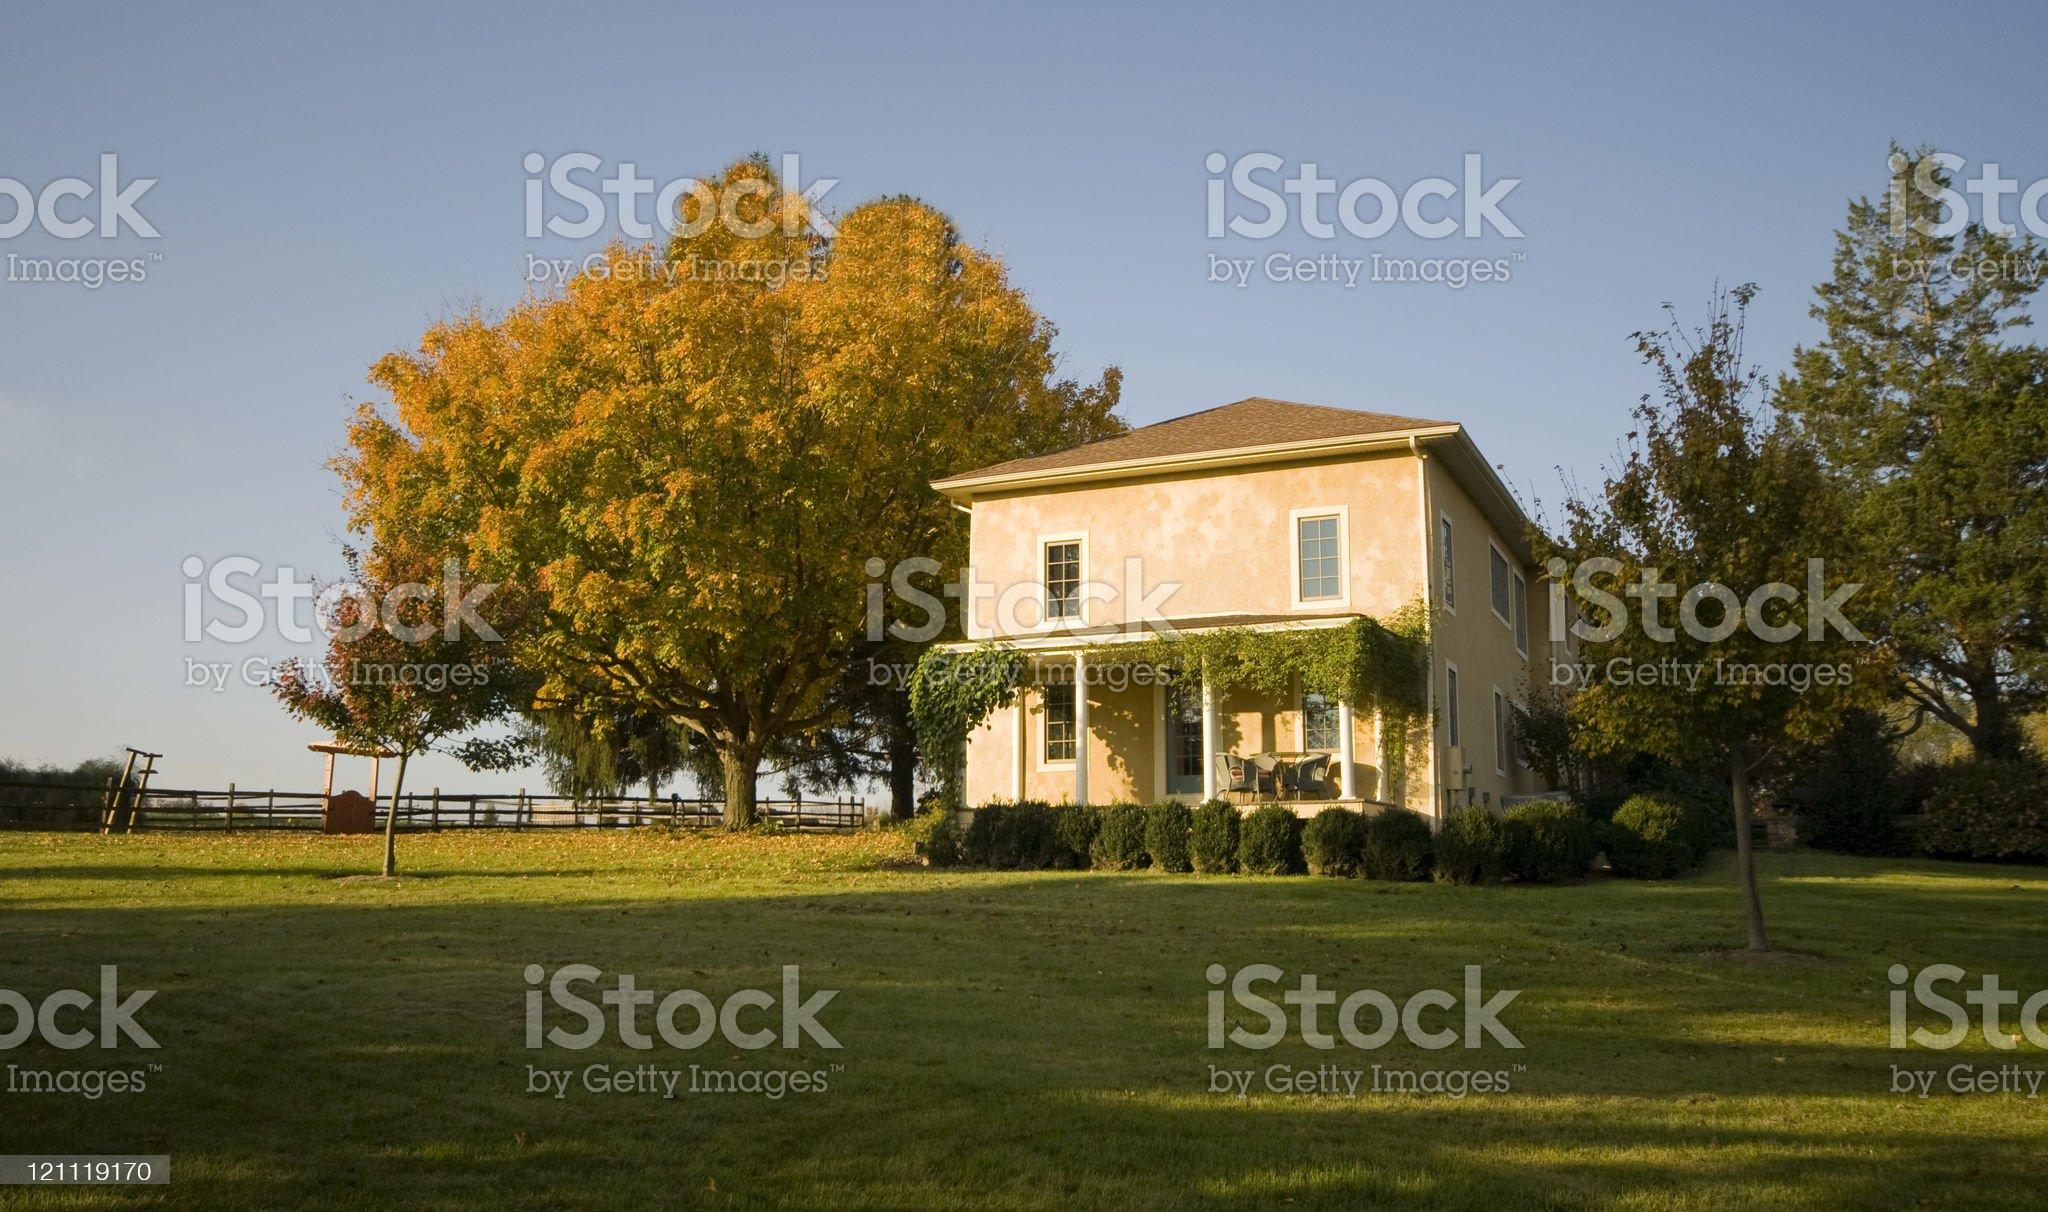 Chester County Pennsylvania Farm House royalty-free stock photo